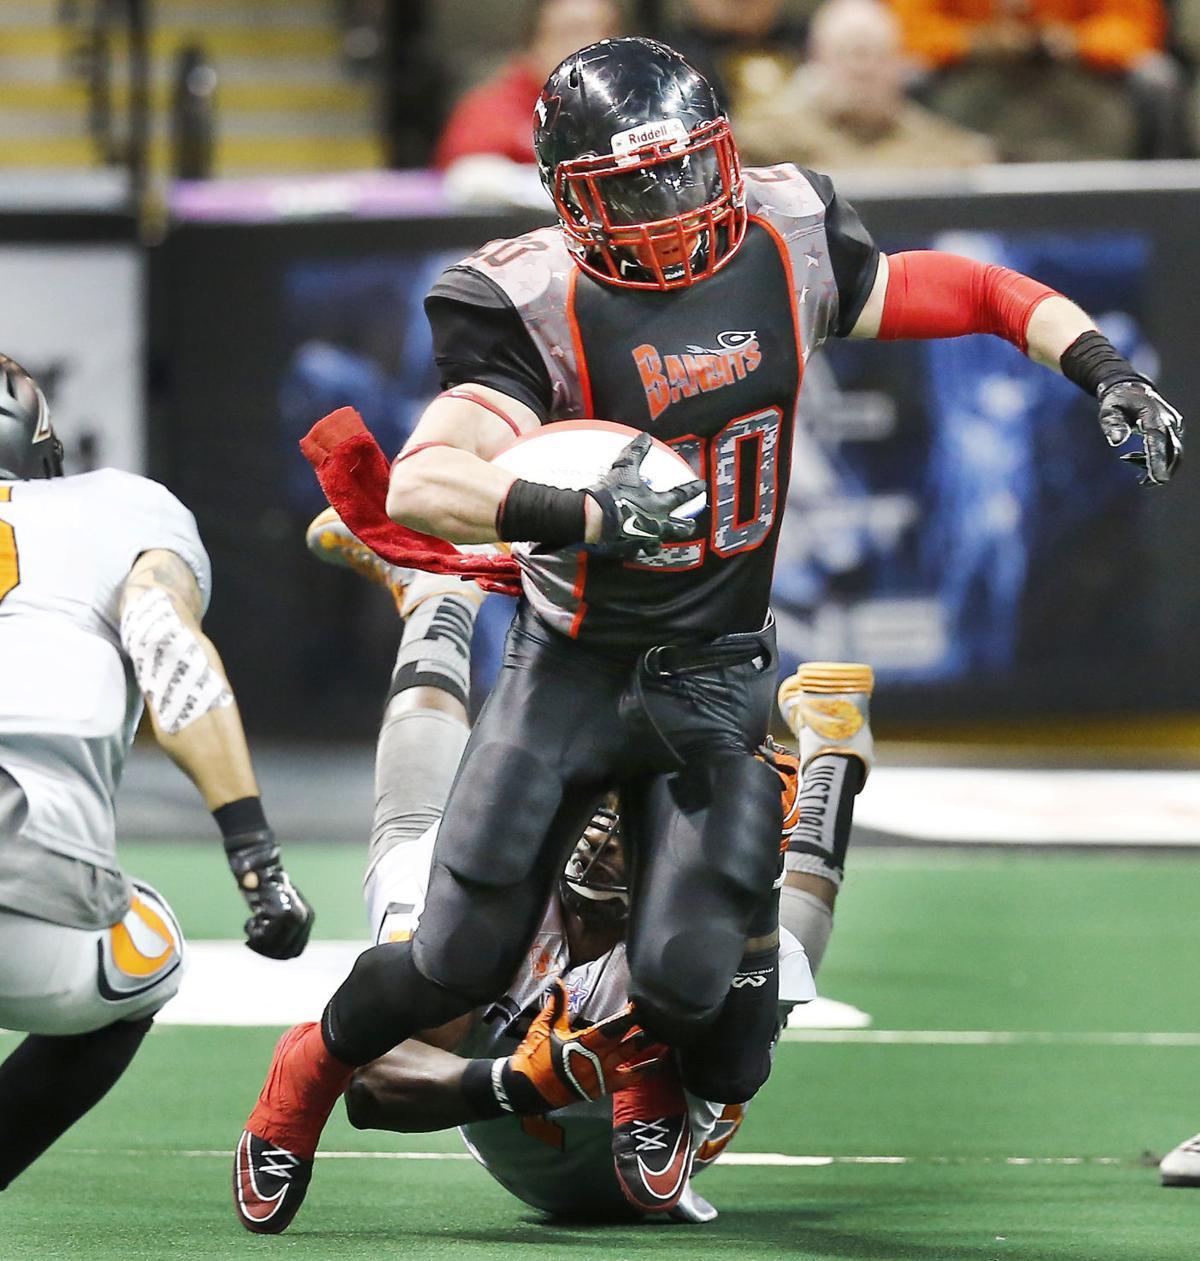 Wichita Force at Sioux City Bandits football